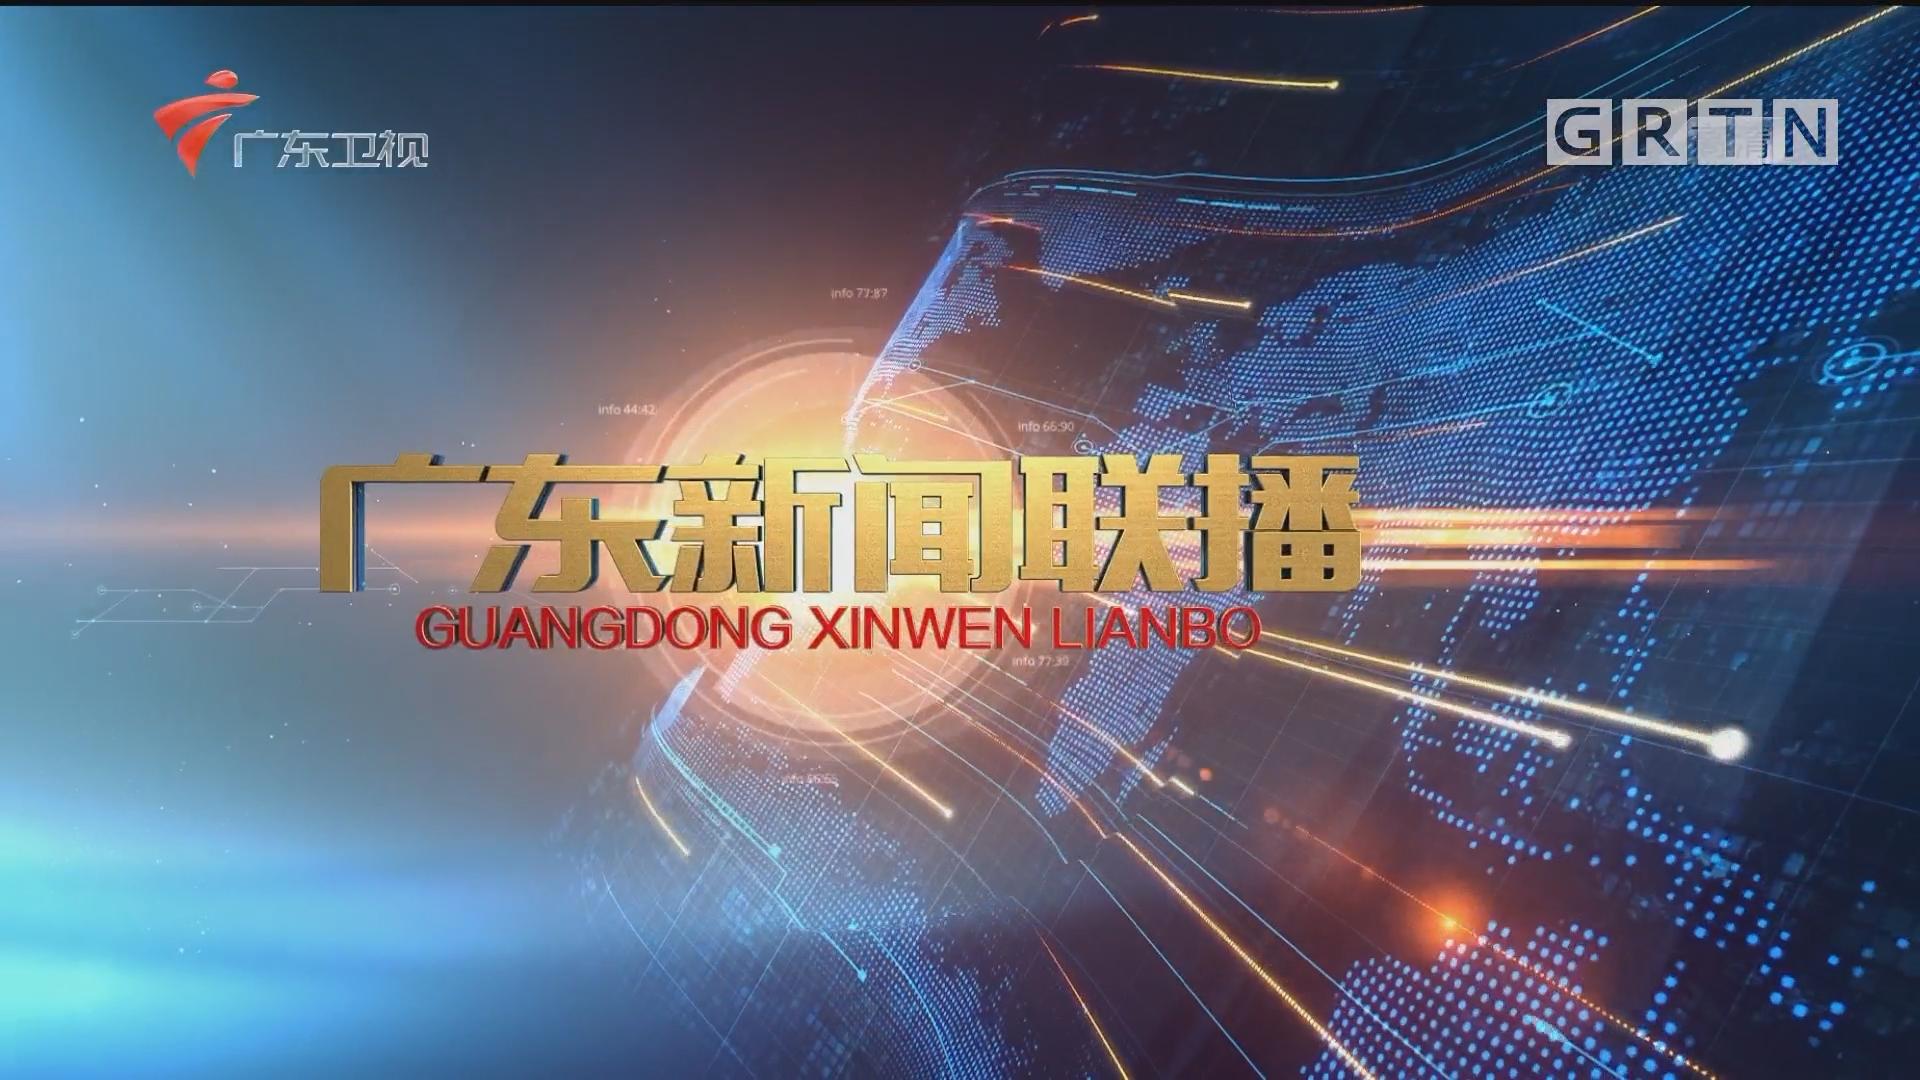 [HD][2017-11-20]广东新闻联播:广东:建设海洋强省 坚持生态优先